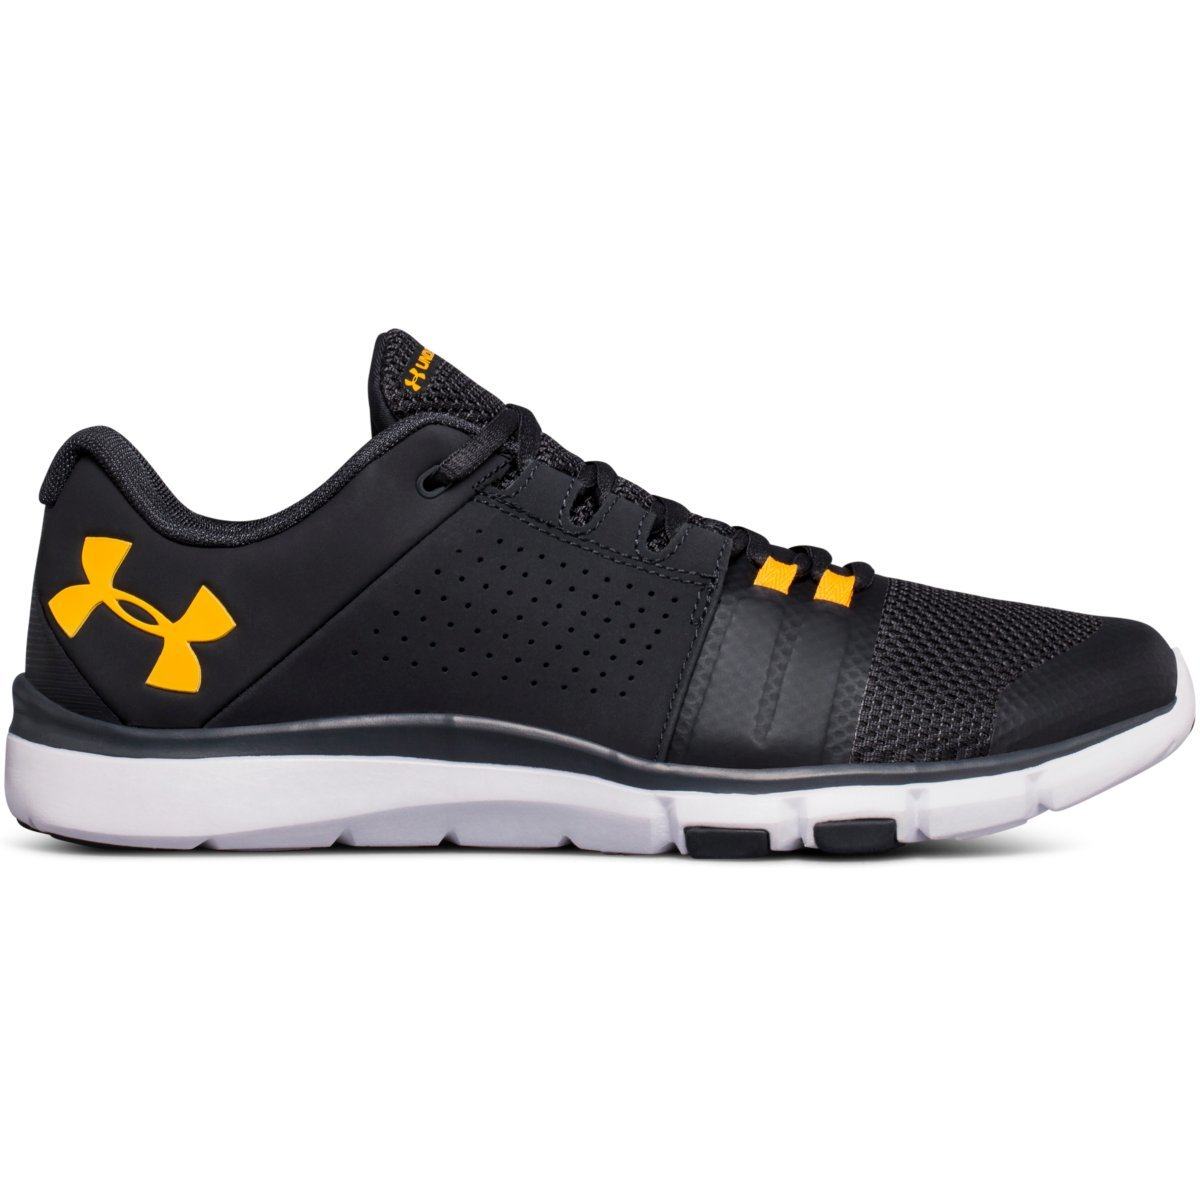 Strive 7 Cross-Training Shoes